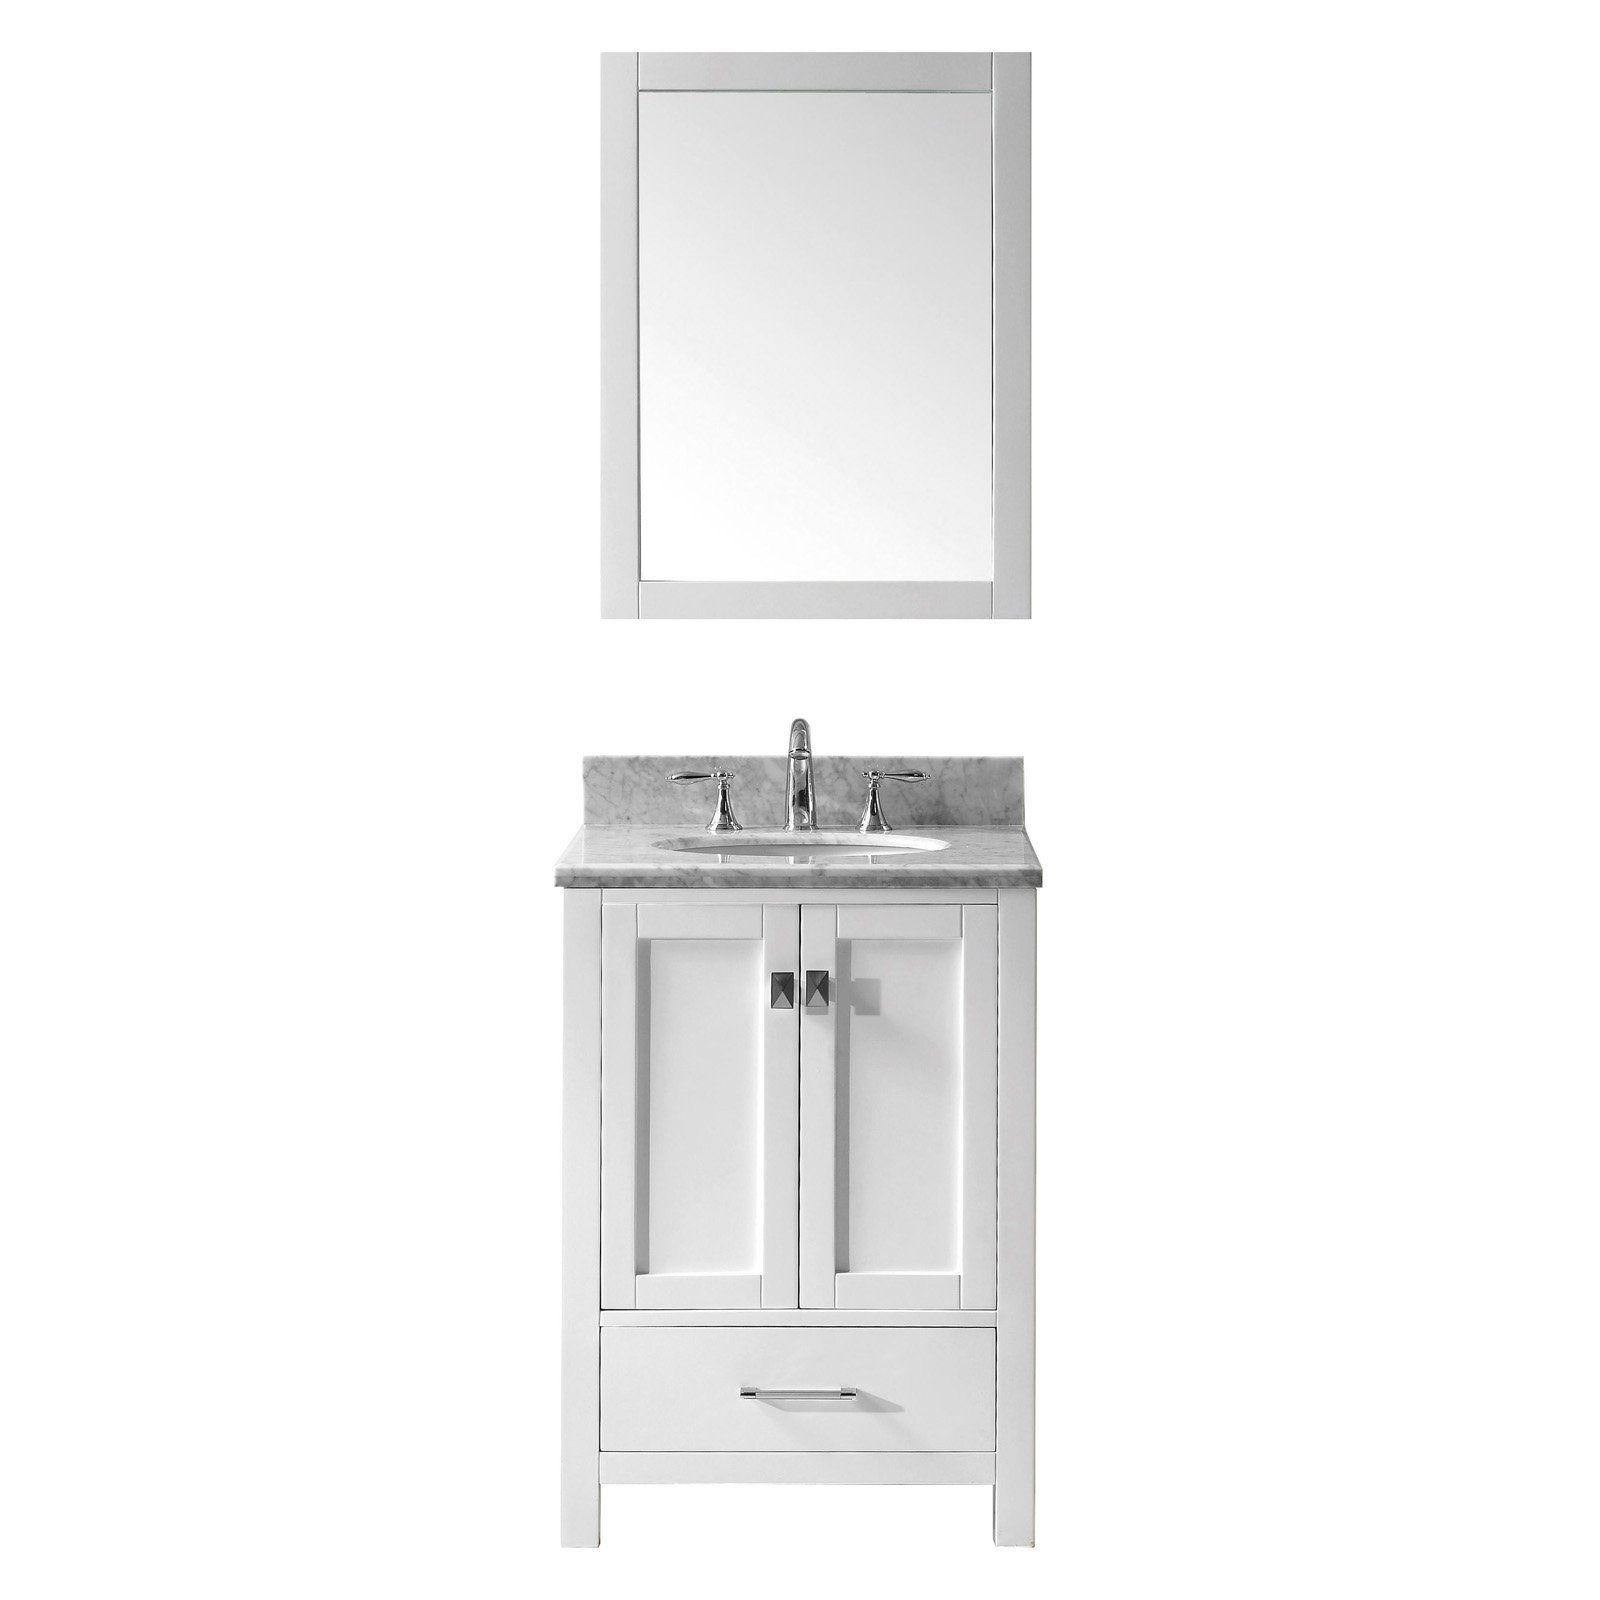 Virtu Usa Caroline Avenue 24 In Single Bathroom Vanity With Round